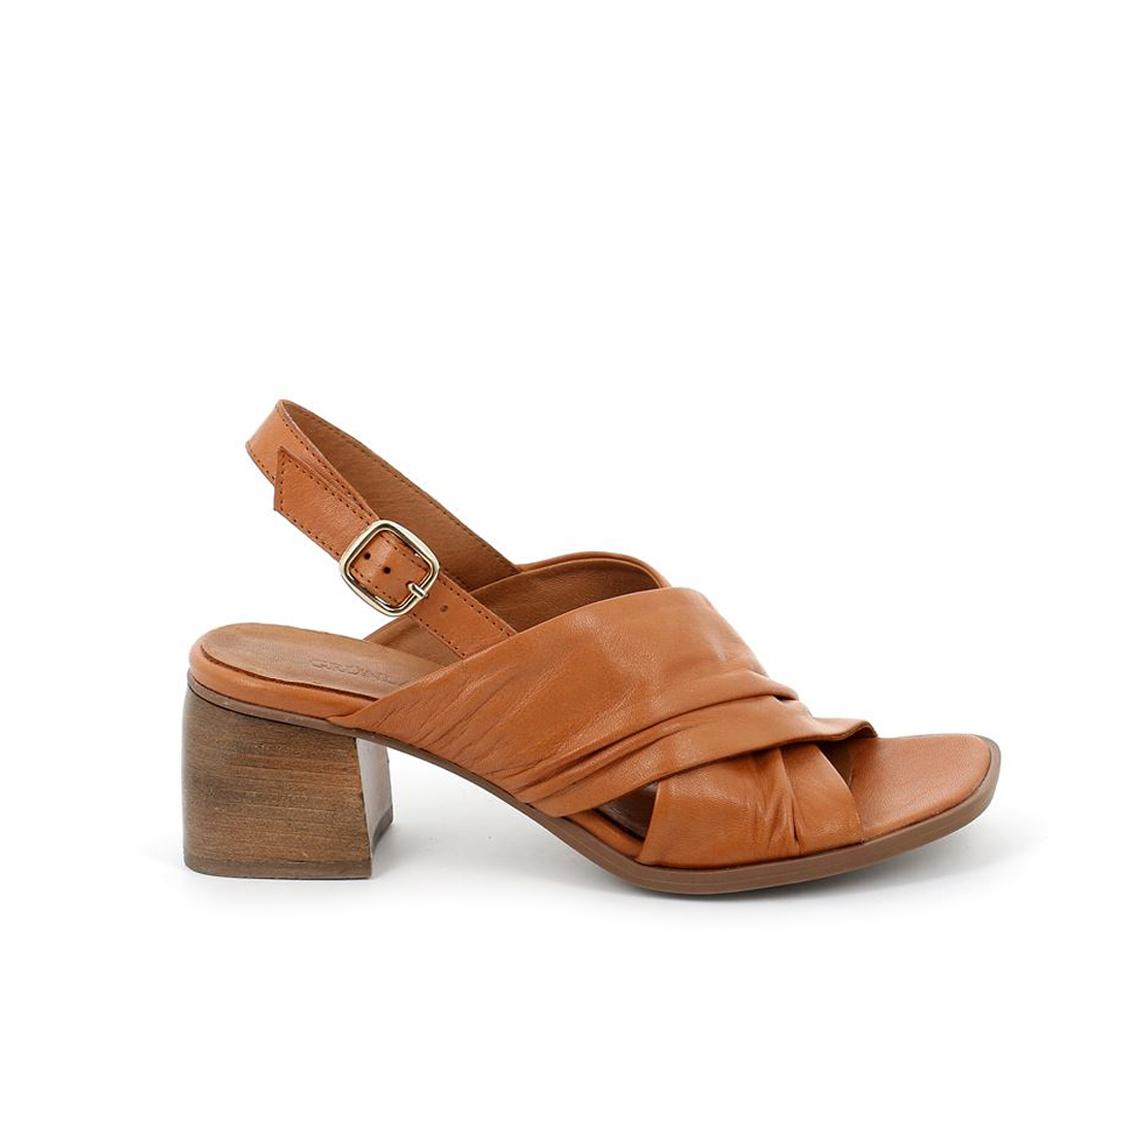 Sandalo cuoio Grunland